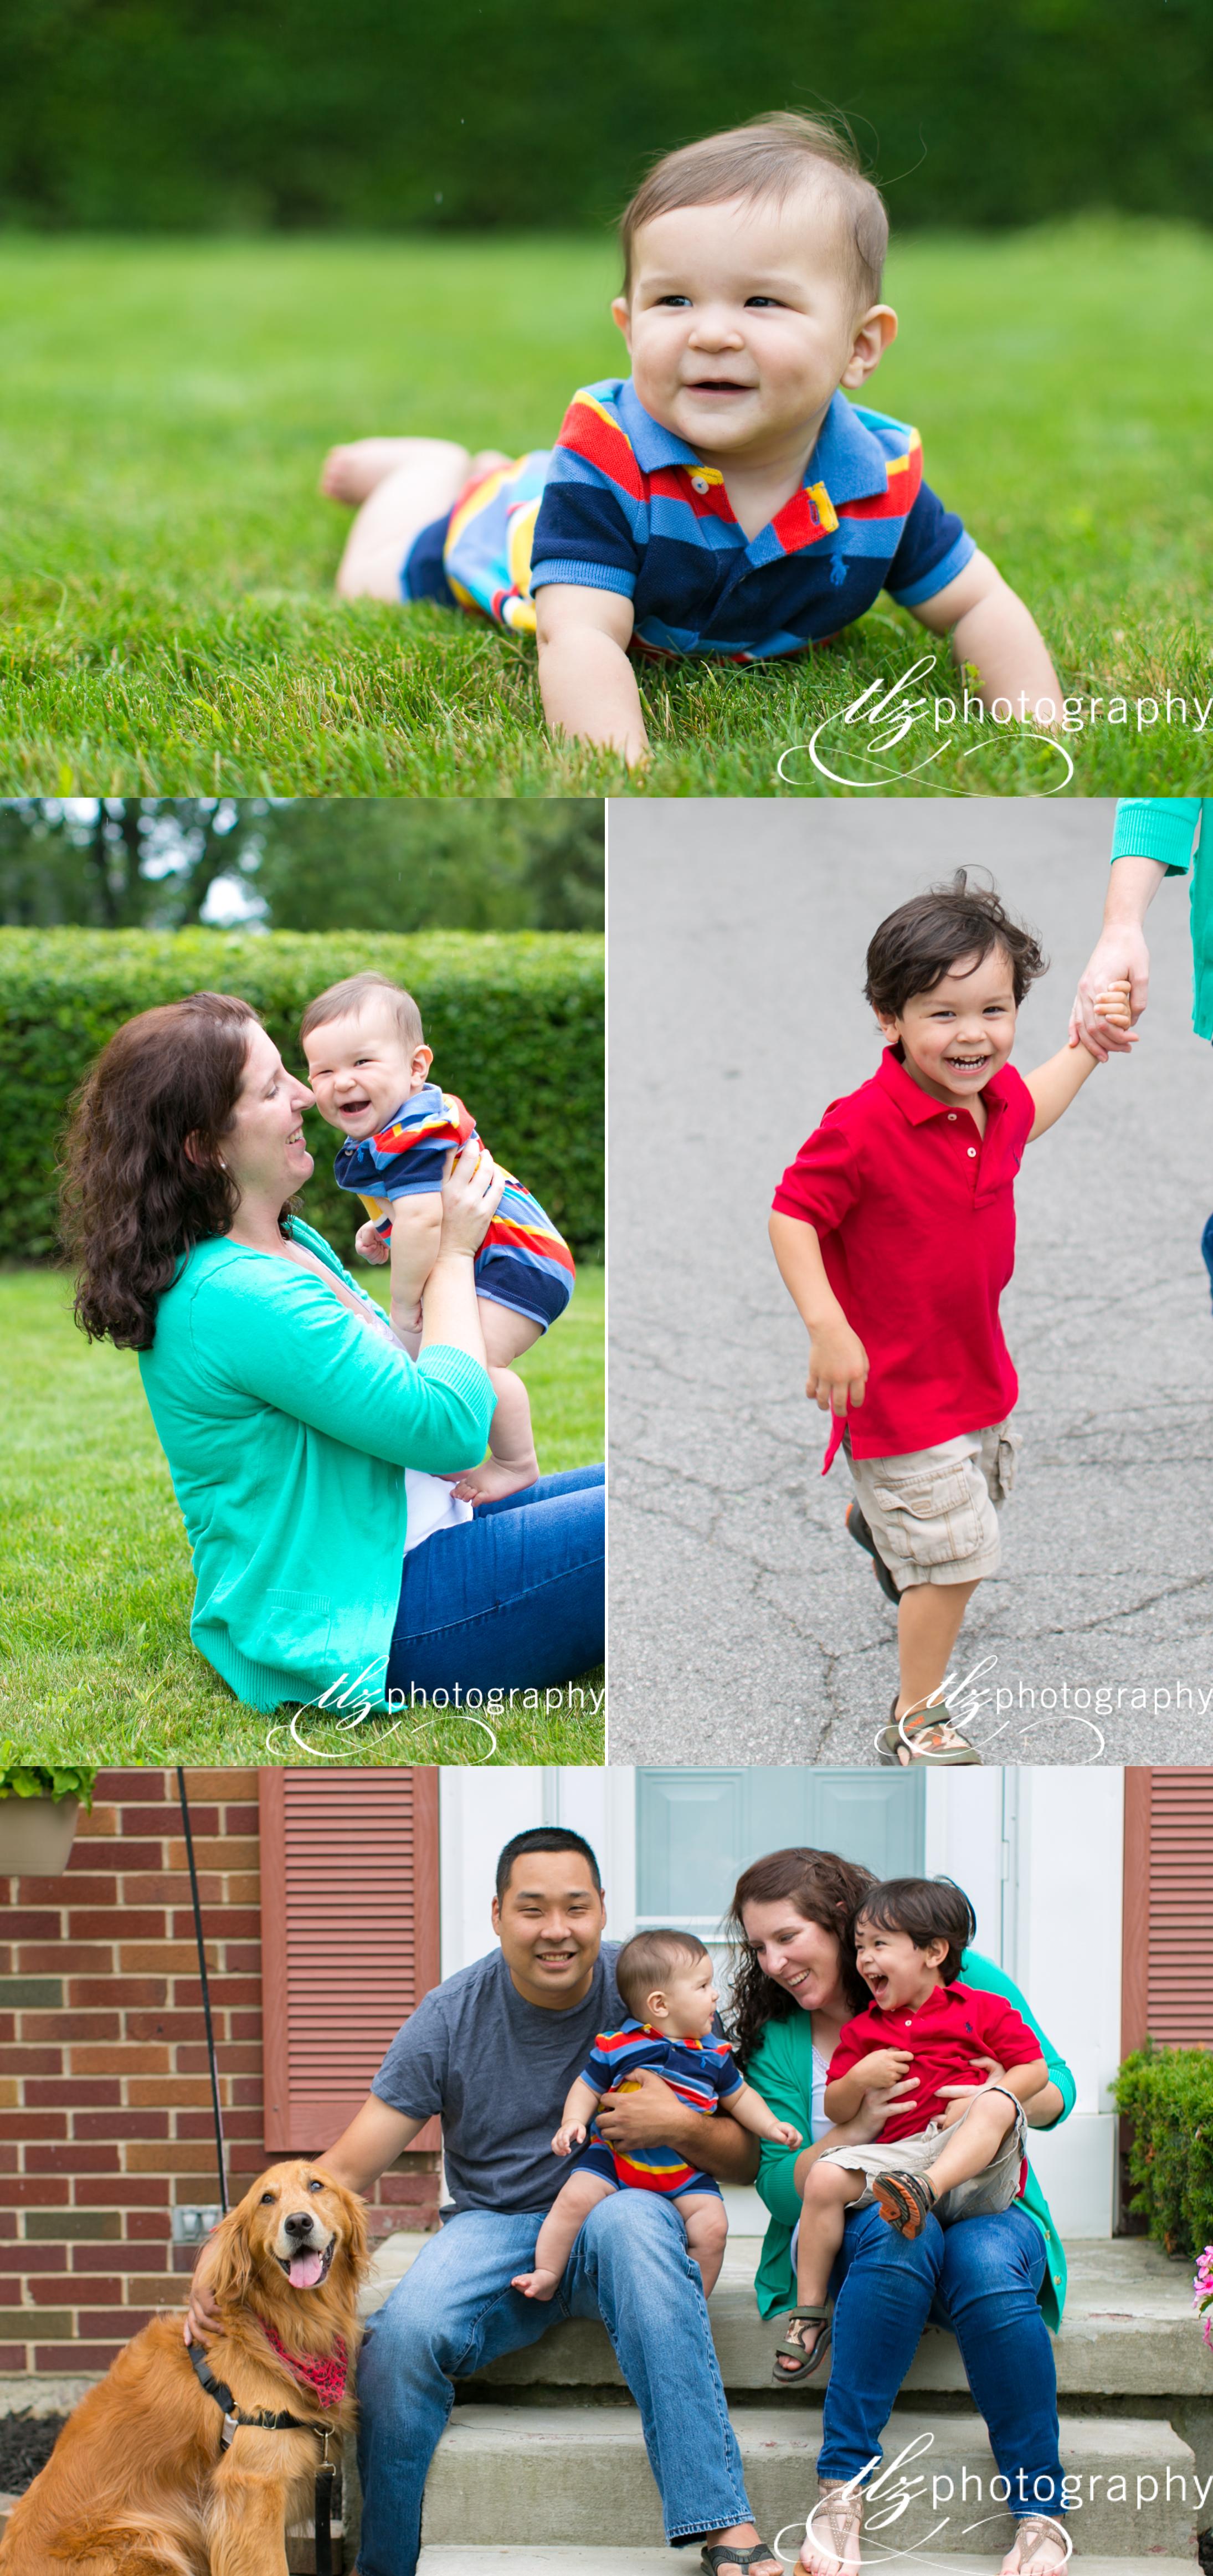 Mix Family4.jpg